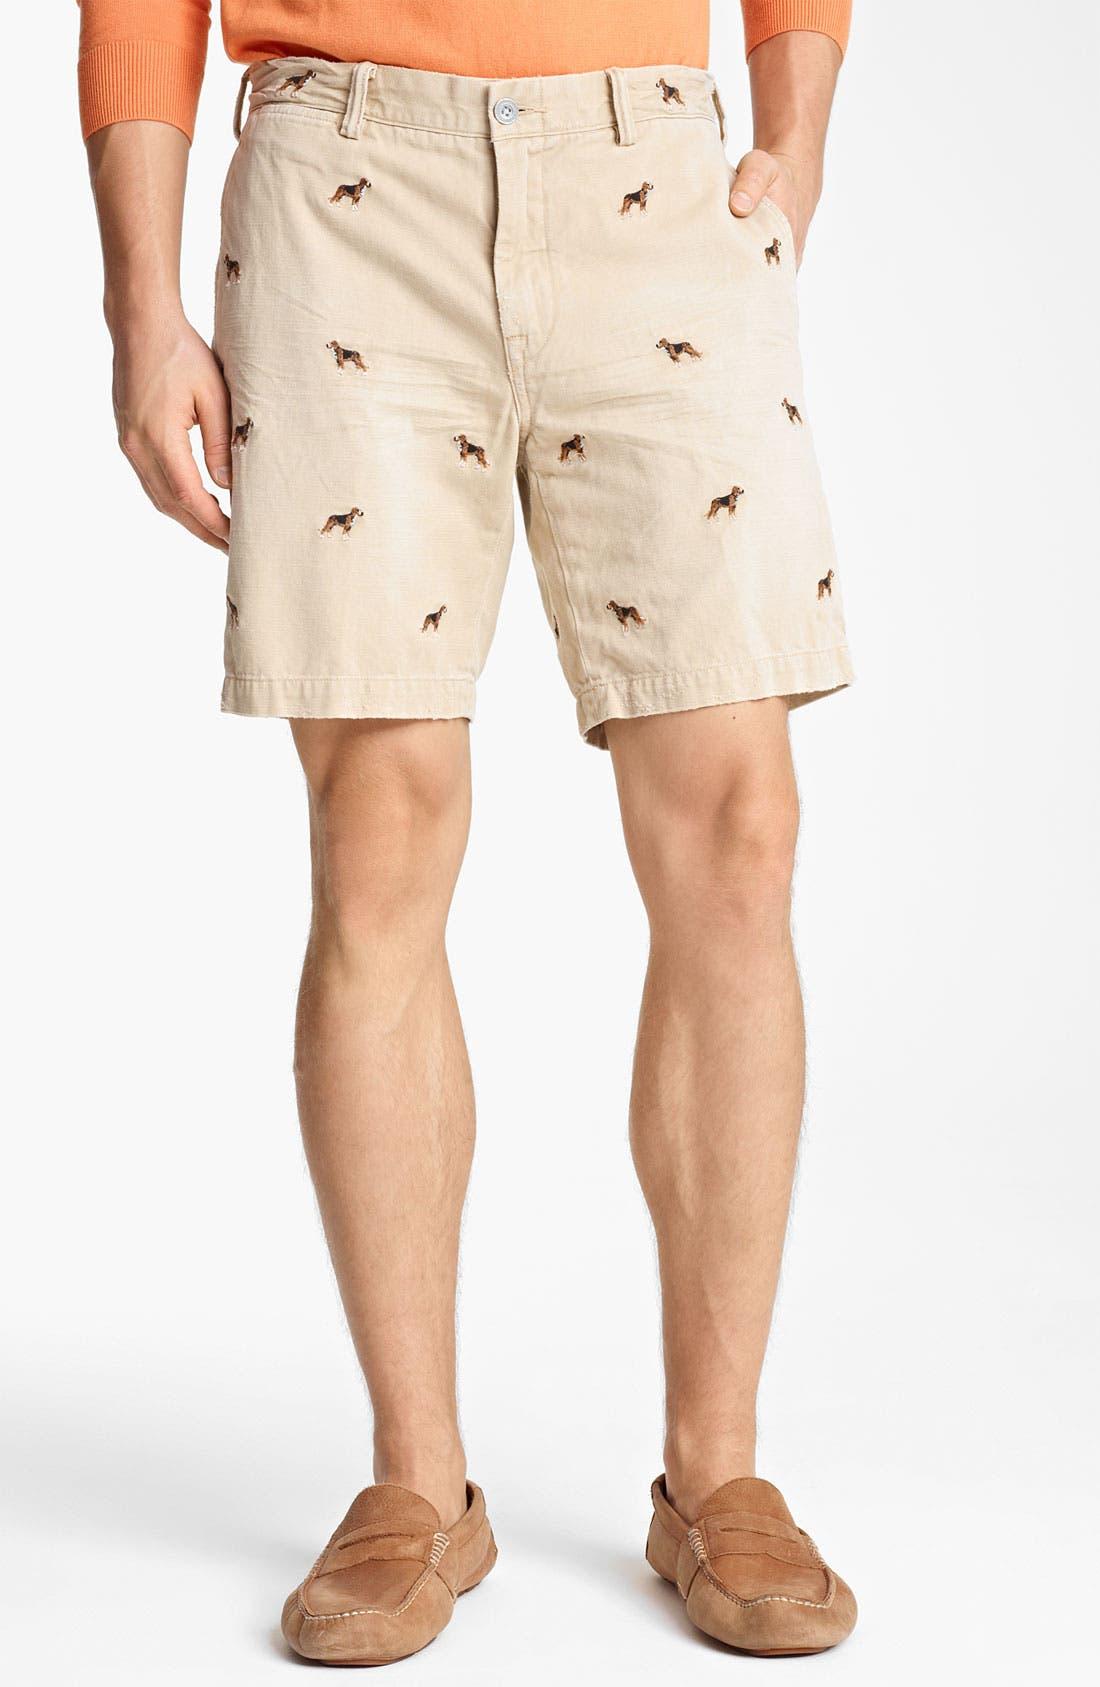 Alternate Image 1 Selected - Polo Ralph Lauren 'Maritime Beagle' Chino Shorts